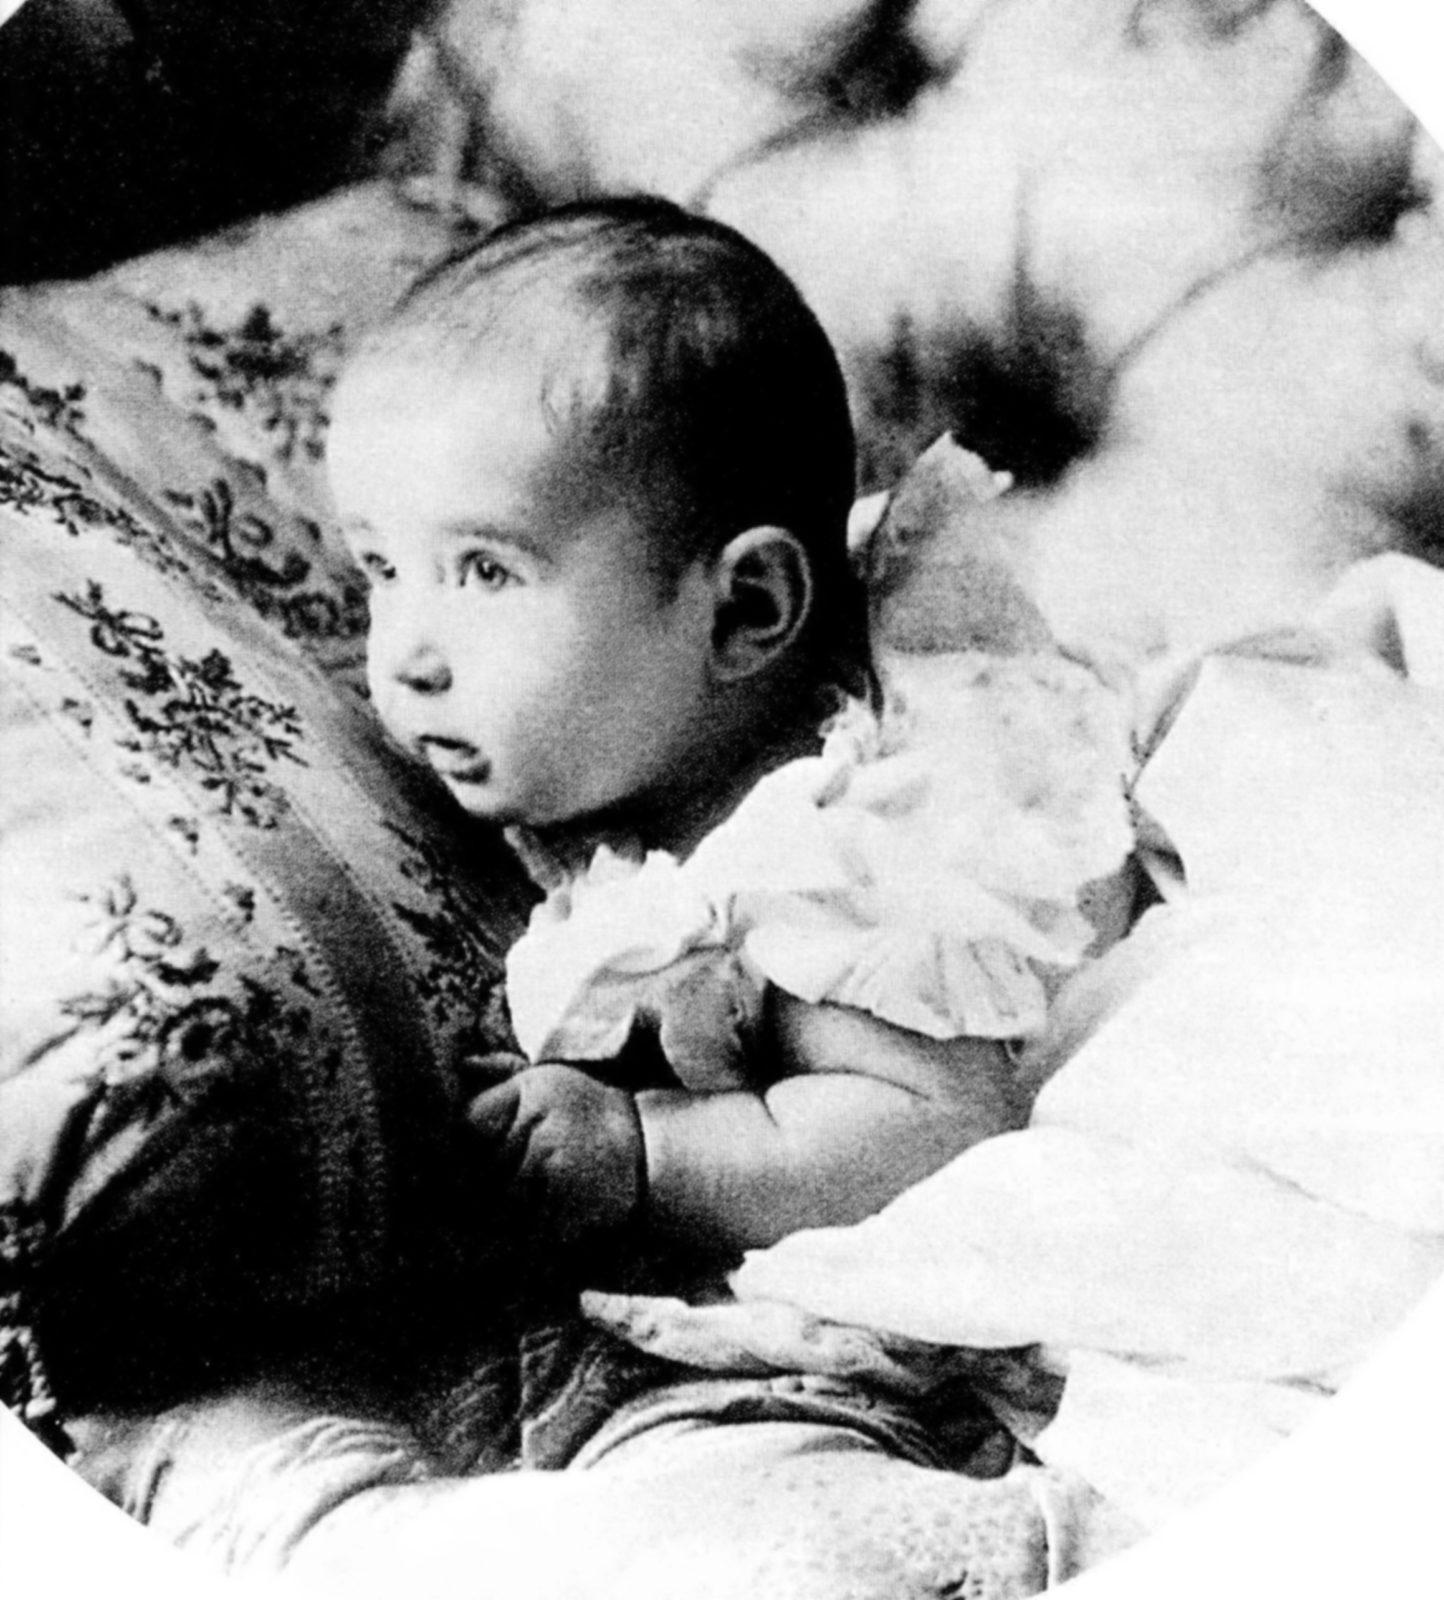 Tsarevich Alexey Nikolaevich son of Emperor Nicholas II and Empress Alexandra Feodorovna. 1904 - 1905